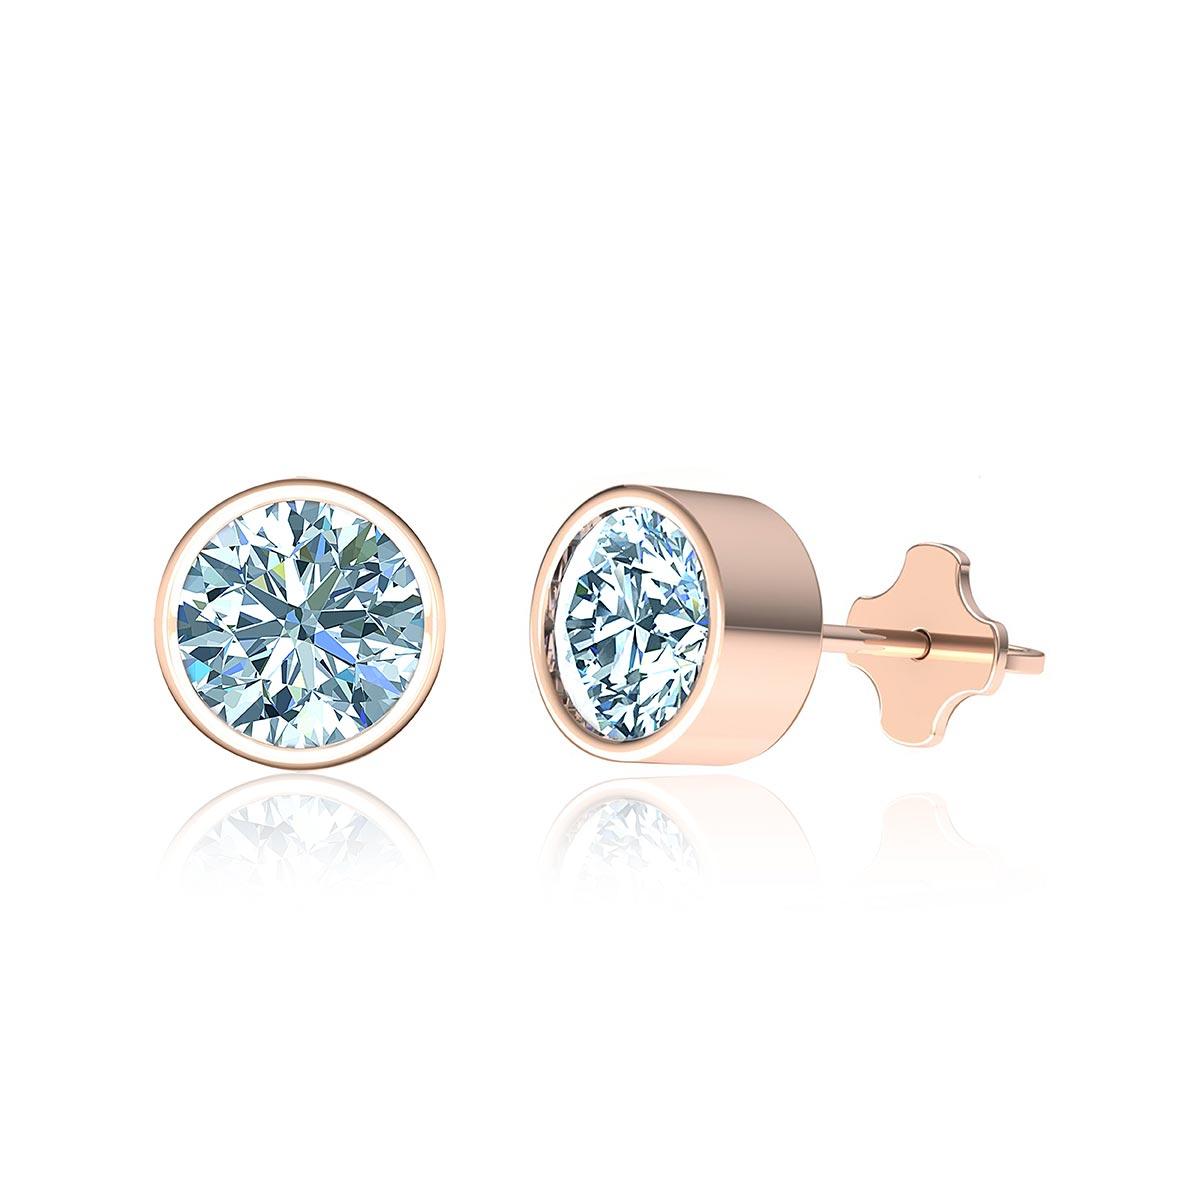 Shooting Star Diamond Stud Earrings (1/2 CT. TW.)